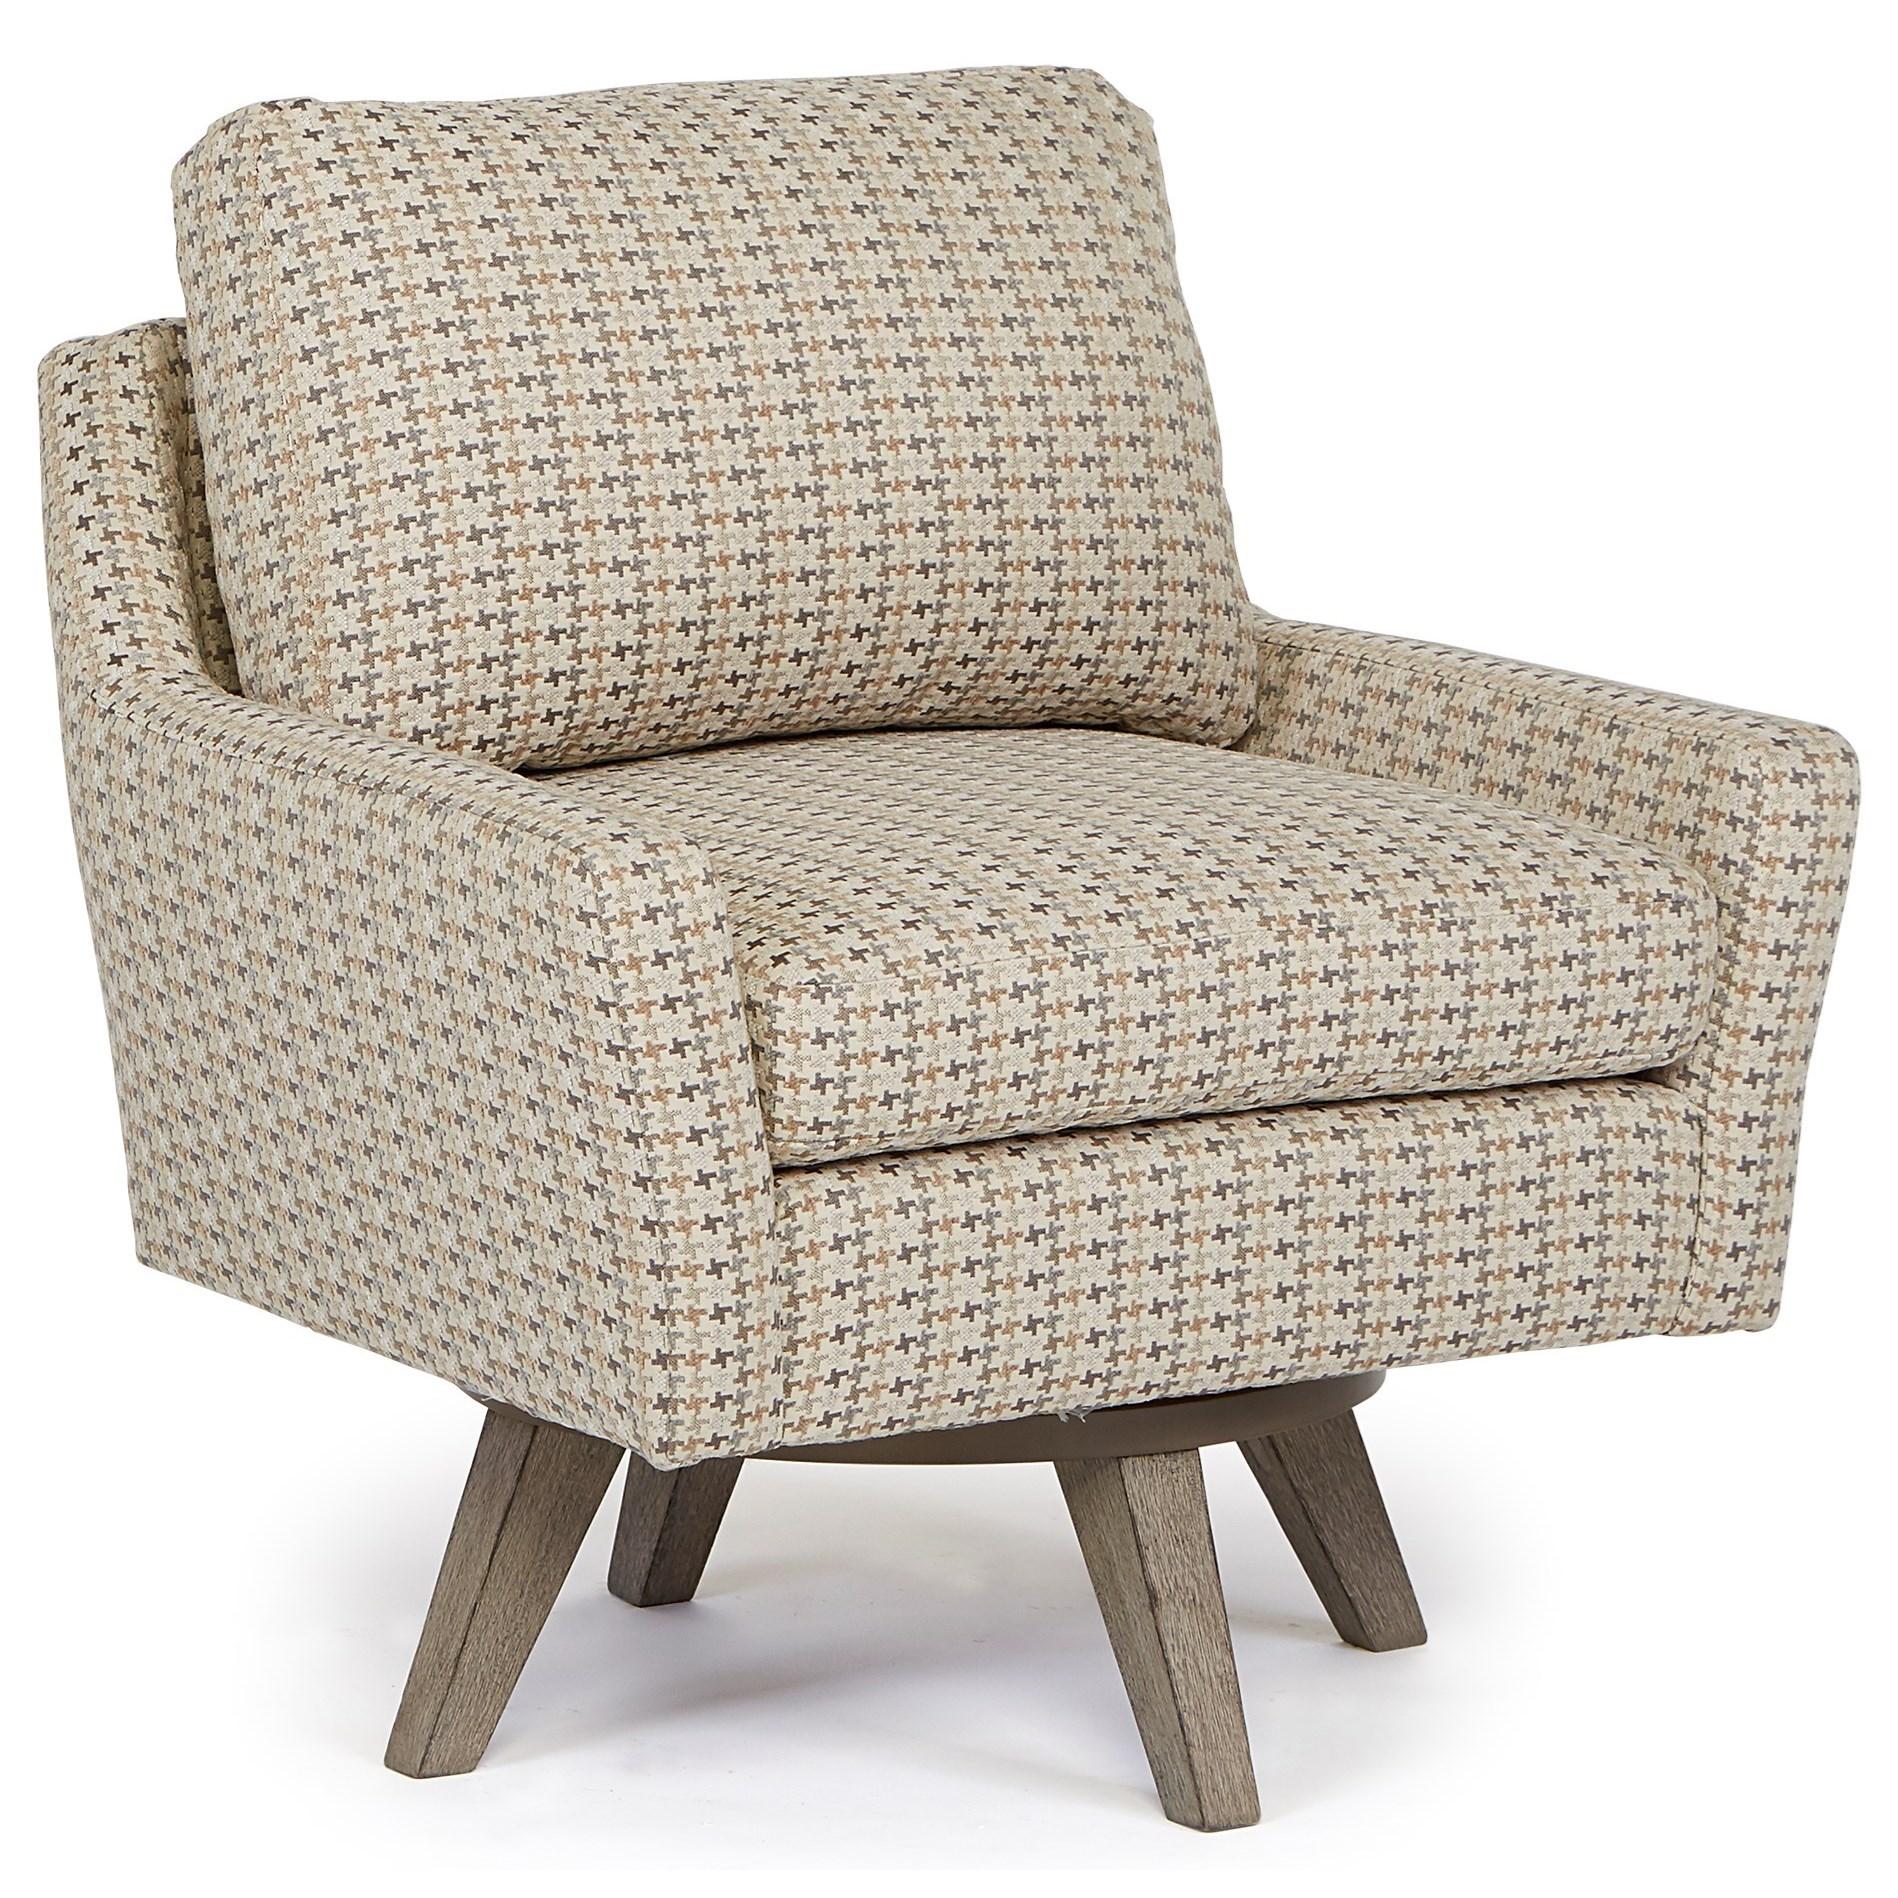 Best Home Furnishings Chairs - Swivel Barrel Seymour Swivel Chair